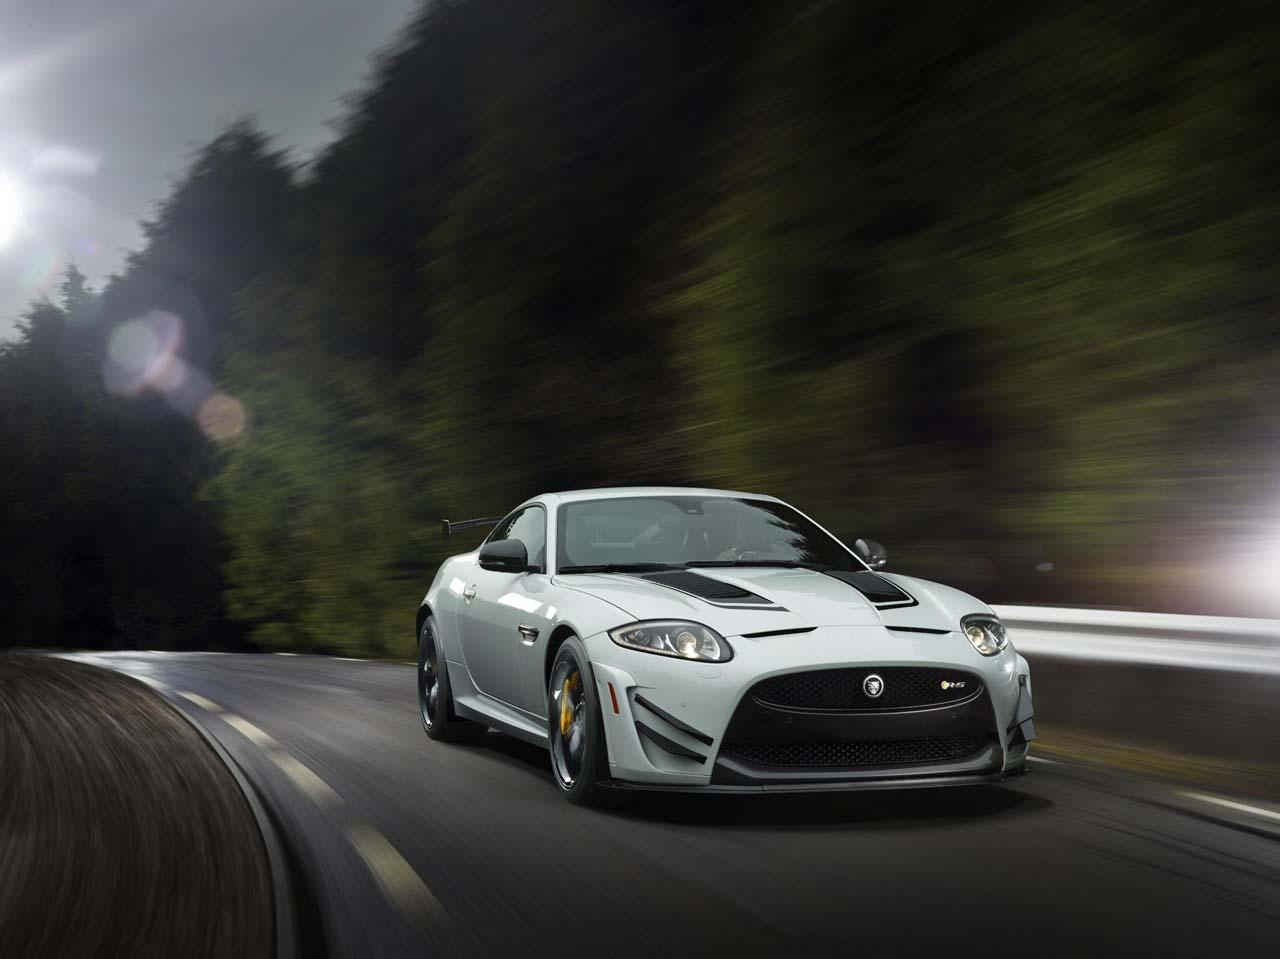 http://www.diseno-art.com/news_content/wp-content/uploads/2013/03/Jaguar-XKR-S-GT-7.jpg